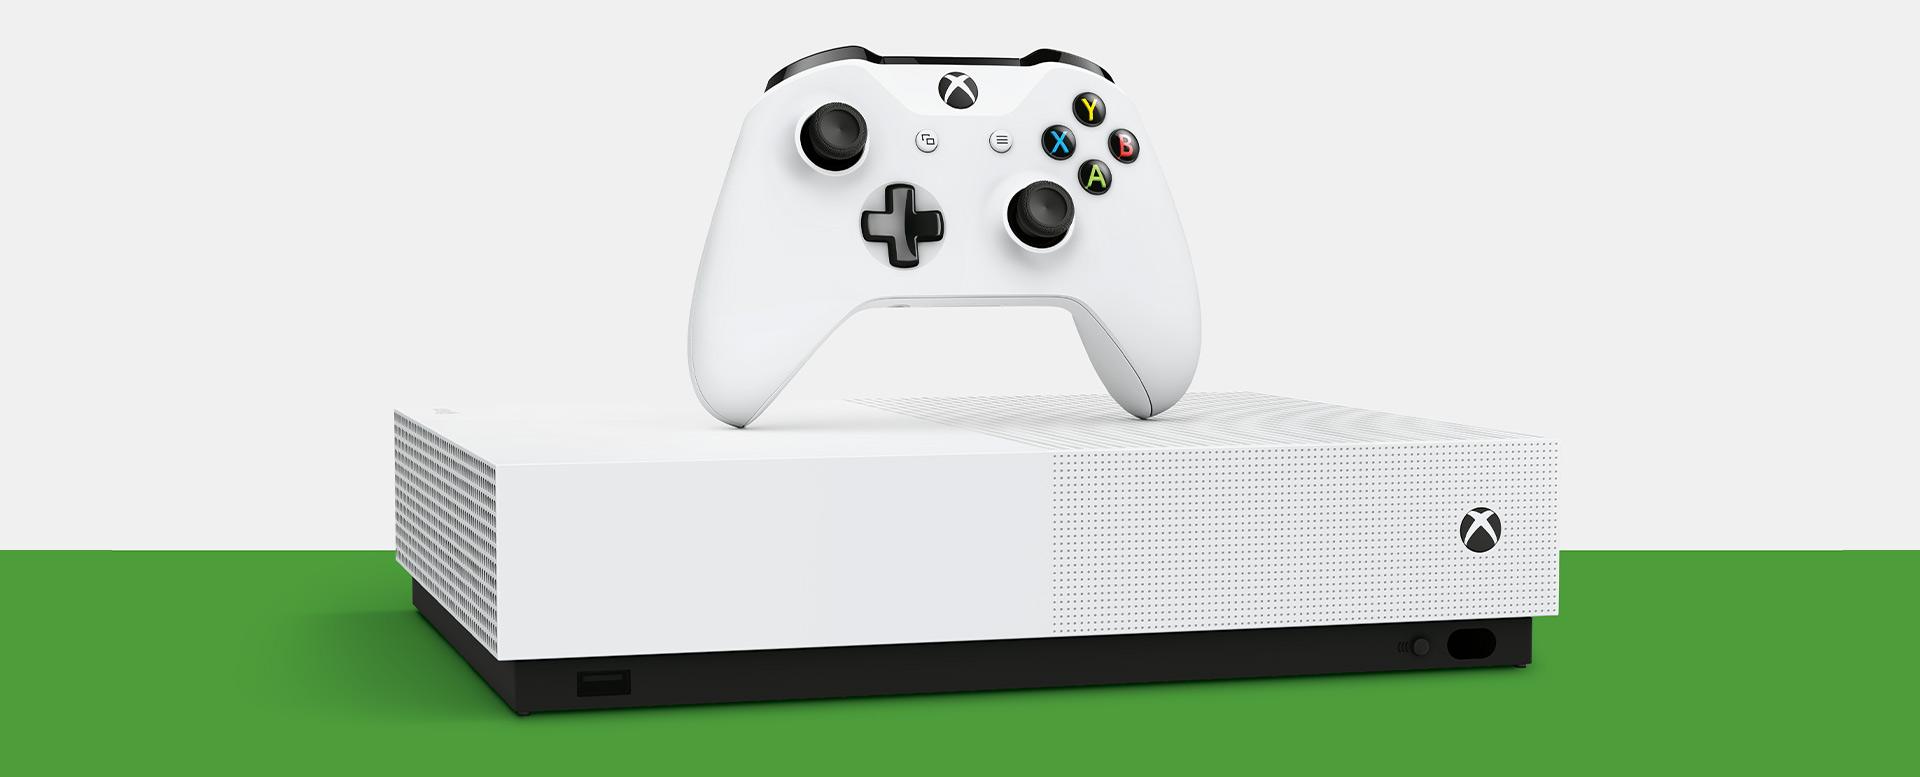 <b>Xbox游戏订阅服务稳步上升 主机销量却下滑33%</b>